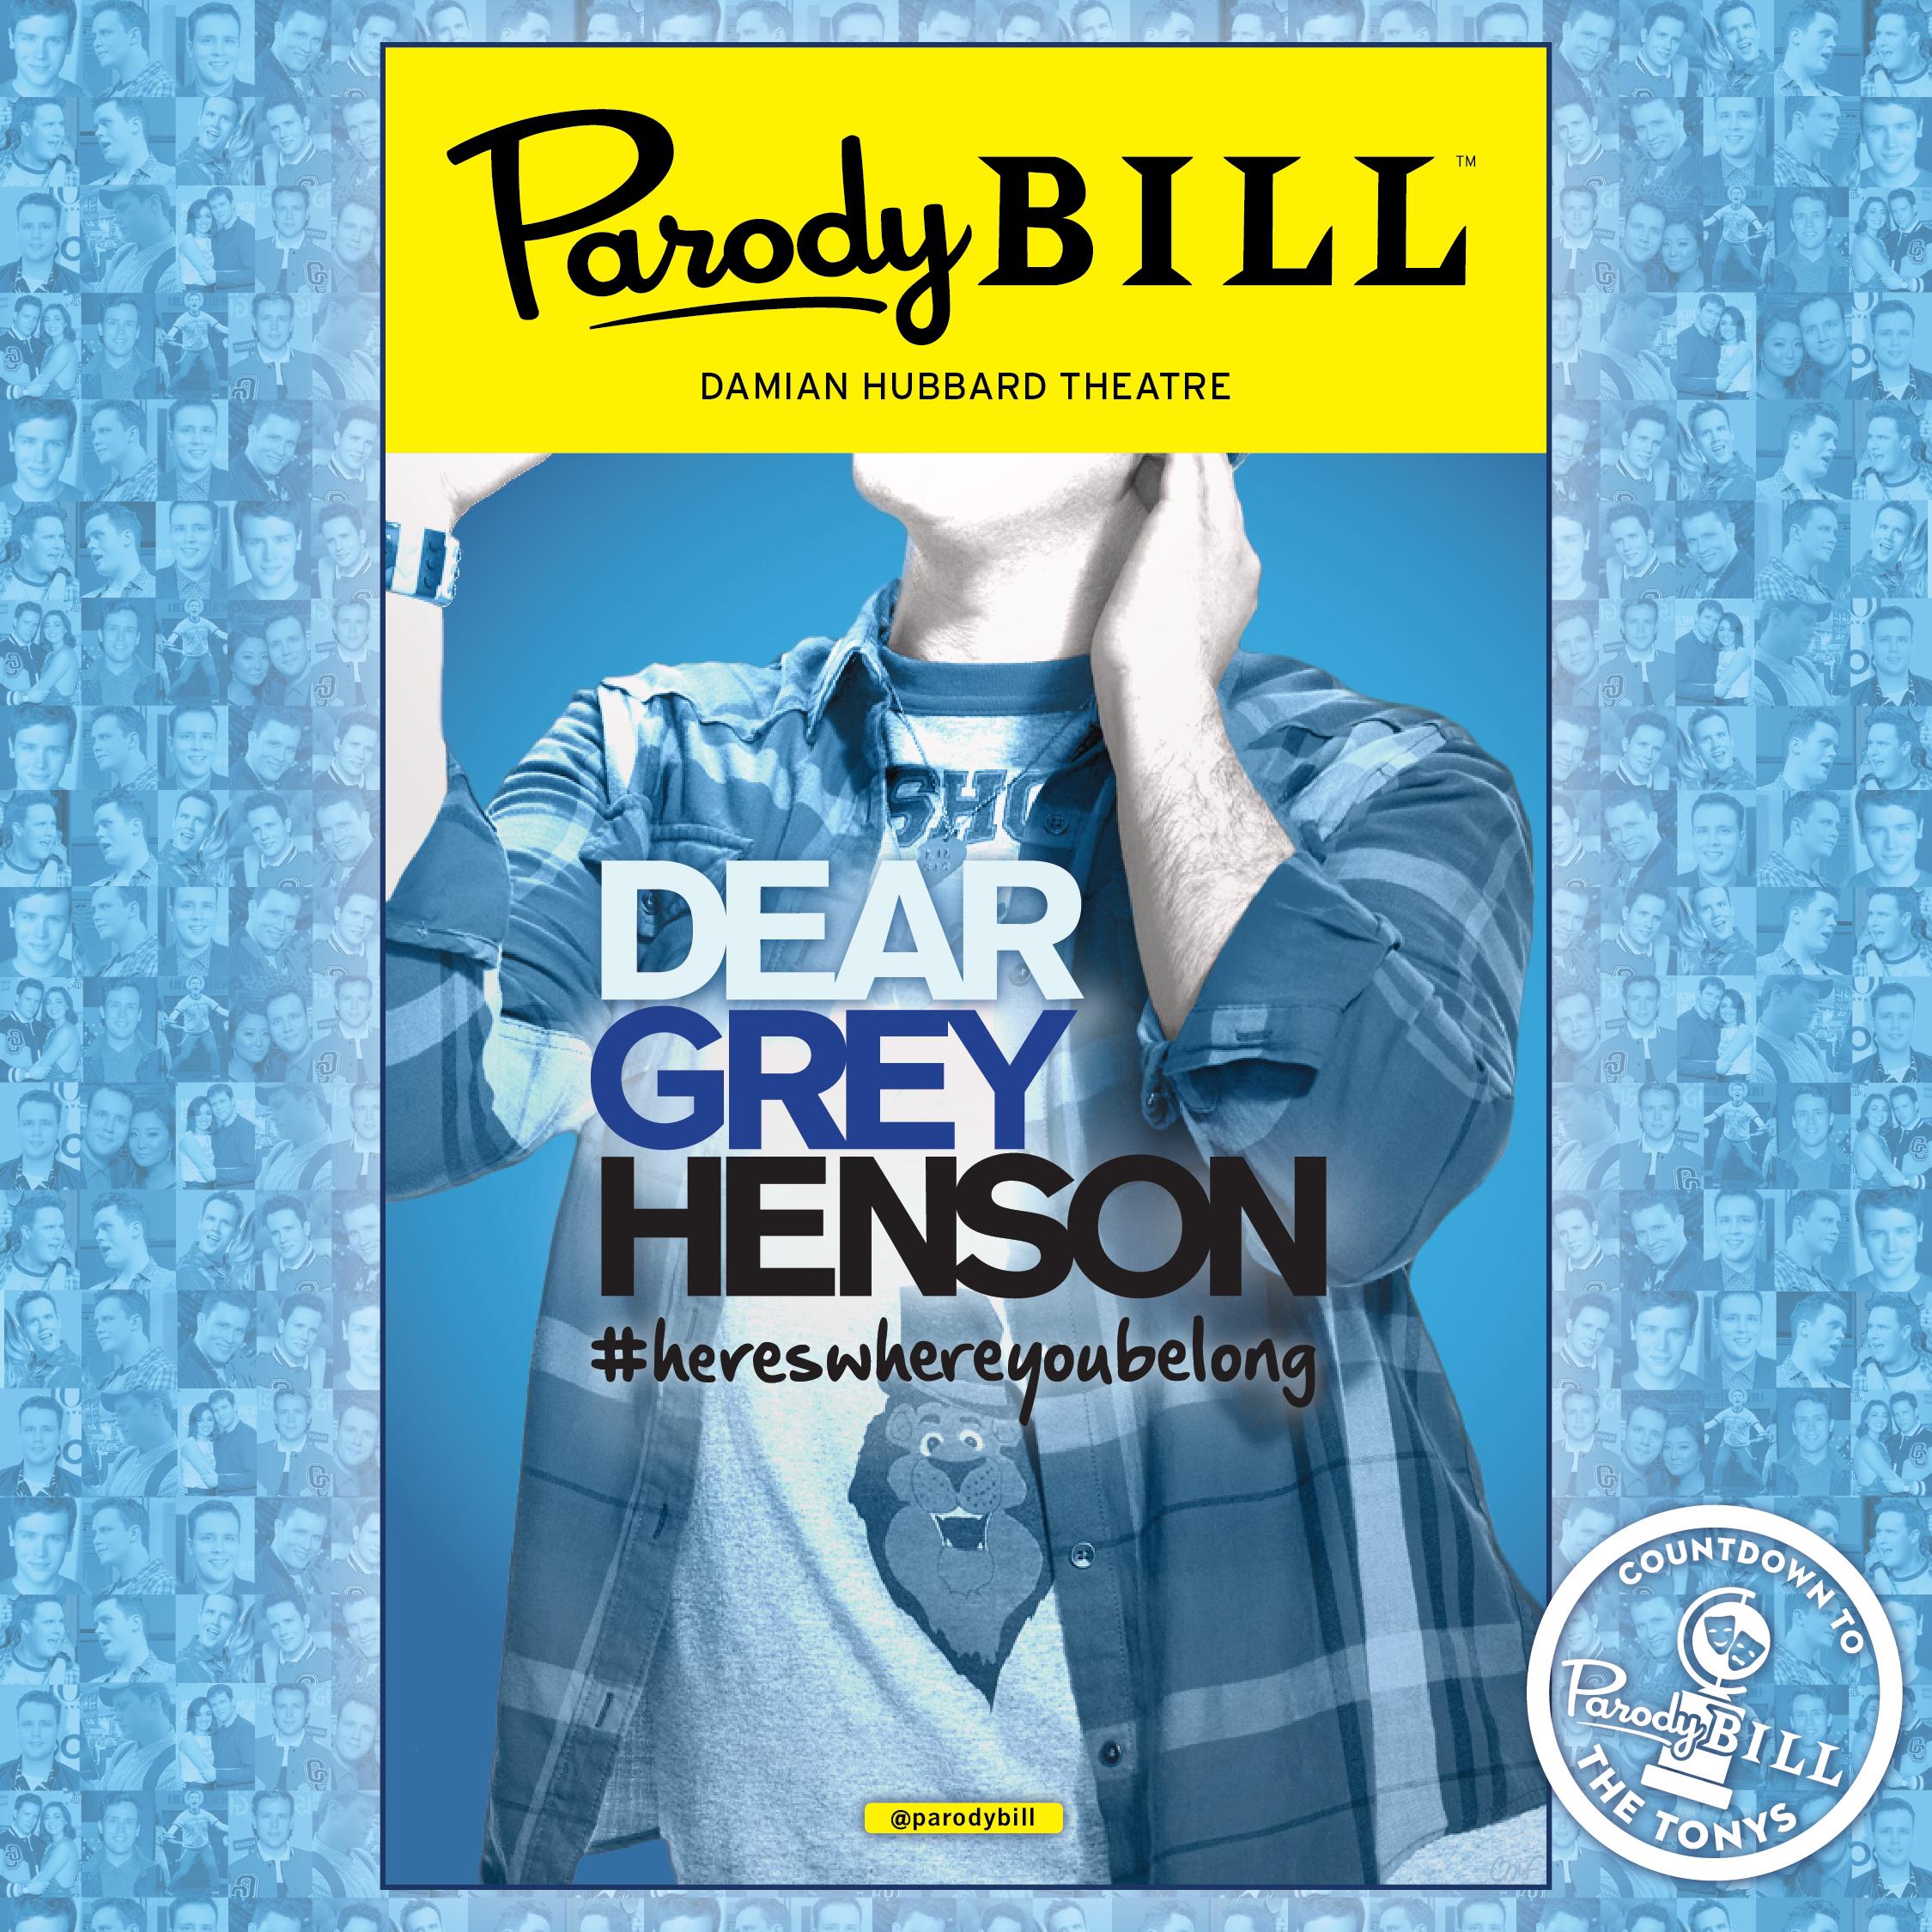 DEAR GREY HENSON